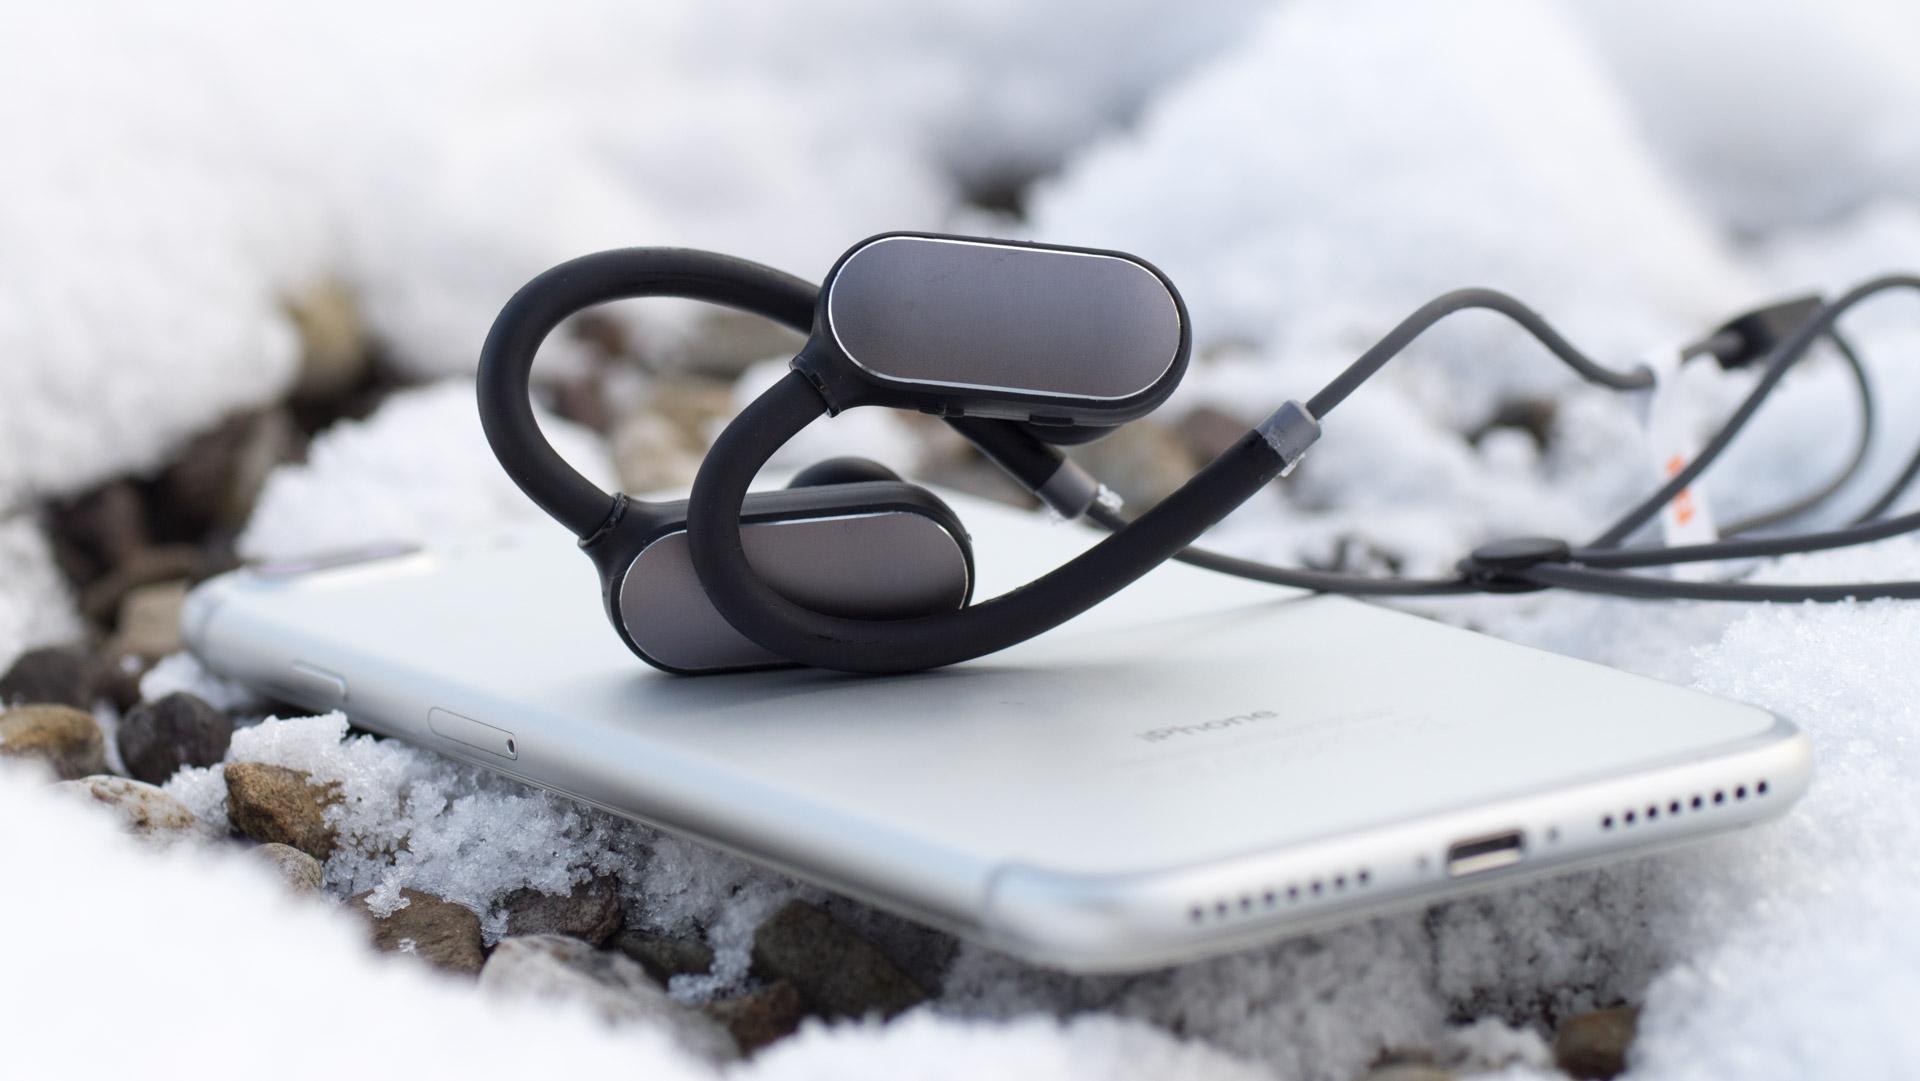 Xiaomis Erste Bluetooth Ohrhrer Im Test Die Xiaomi Wireless Original Mi Sport Headset Earphone Headphone Fazit Earbuds